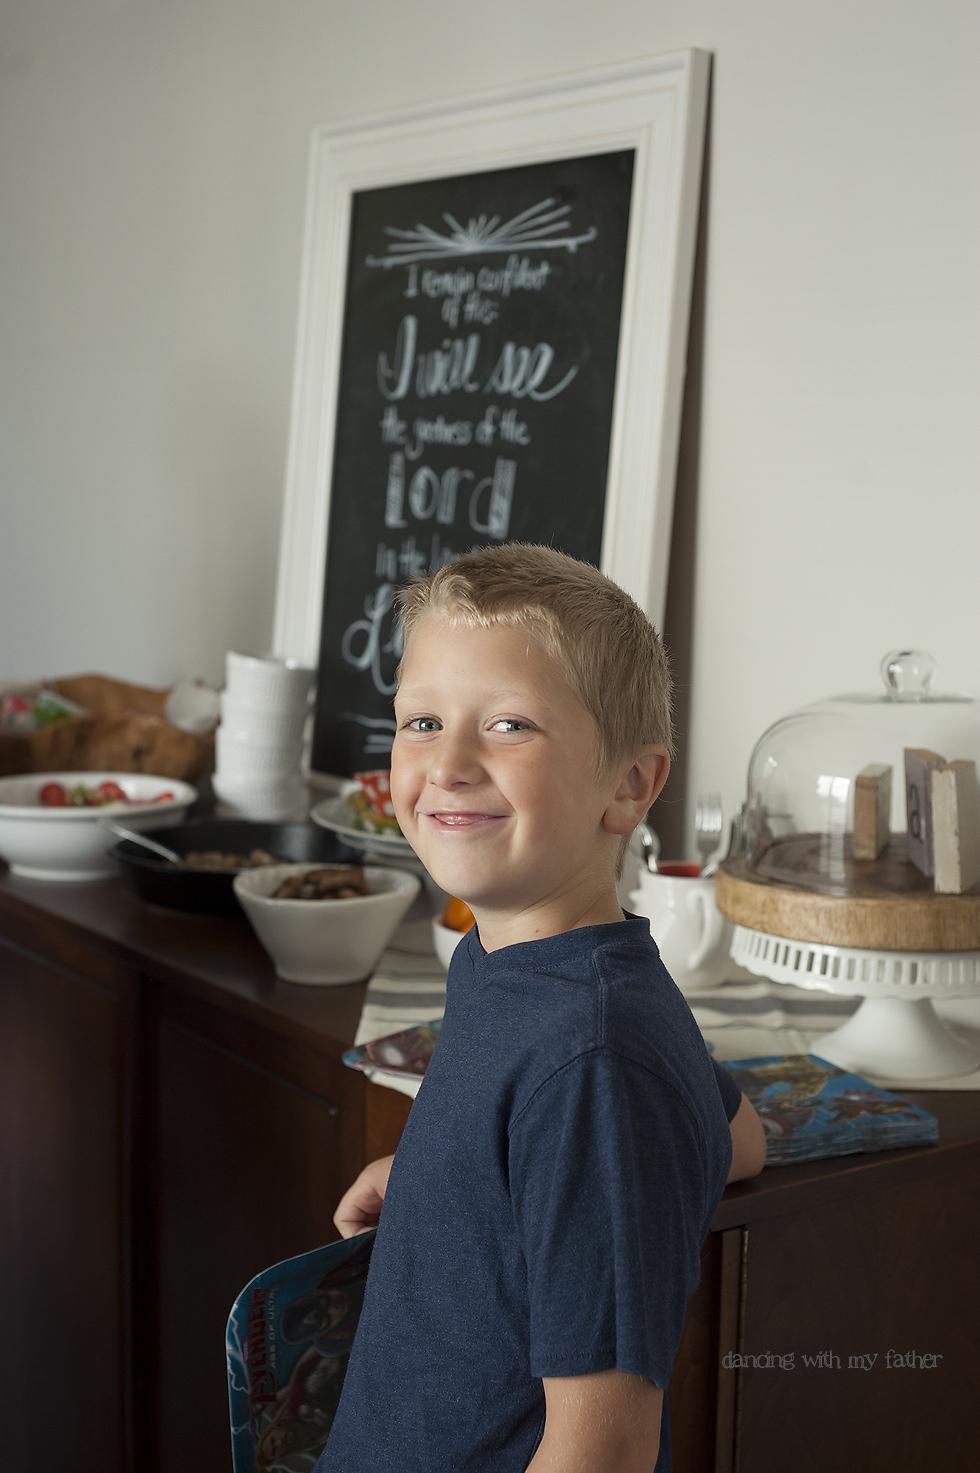 whole_30_kids_birthday_recipes_011